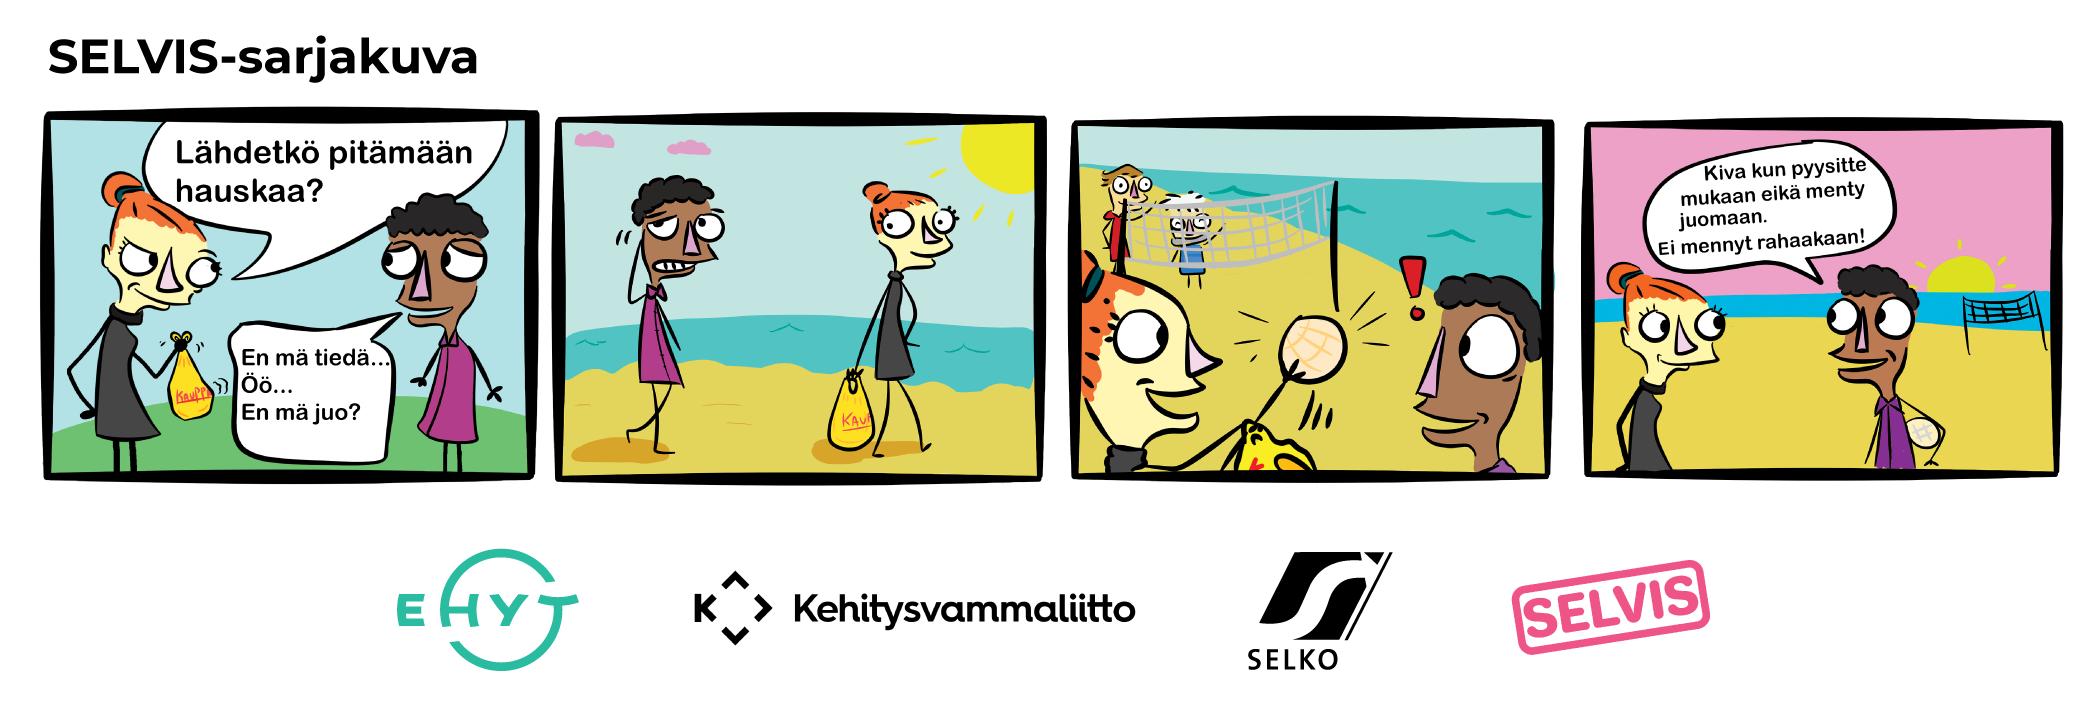 SELVIS-sarjakuva alkoholista, lue tekstivastine sarjakuvan alapuolelta.